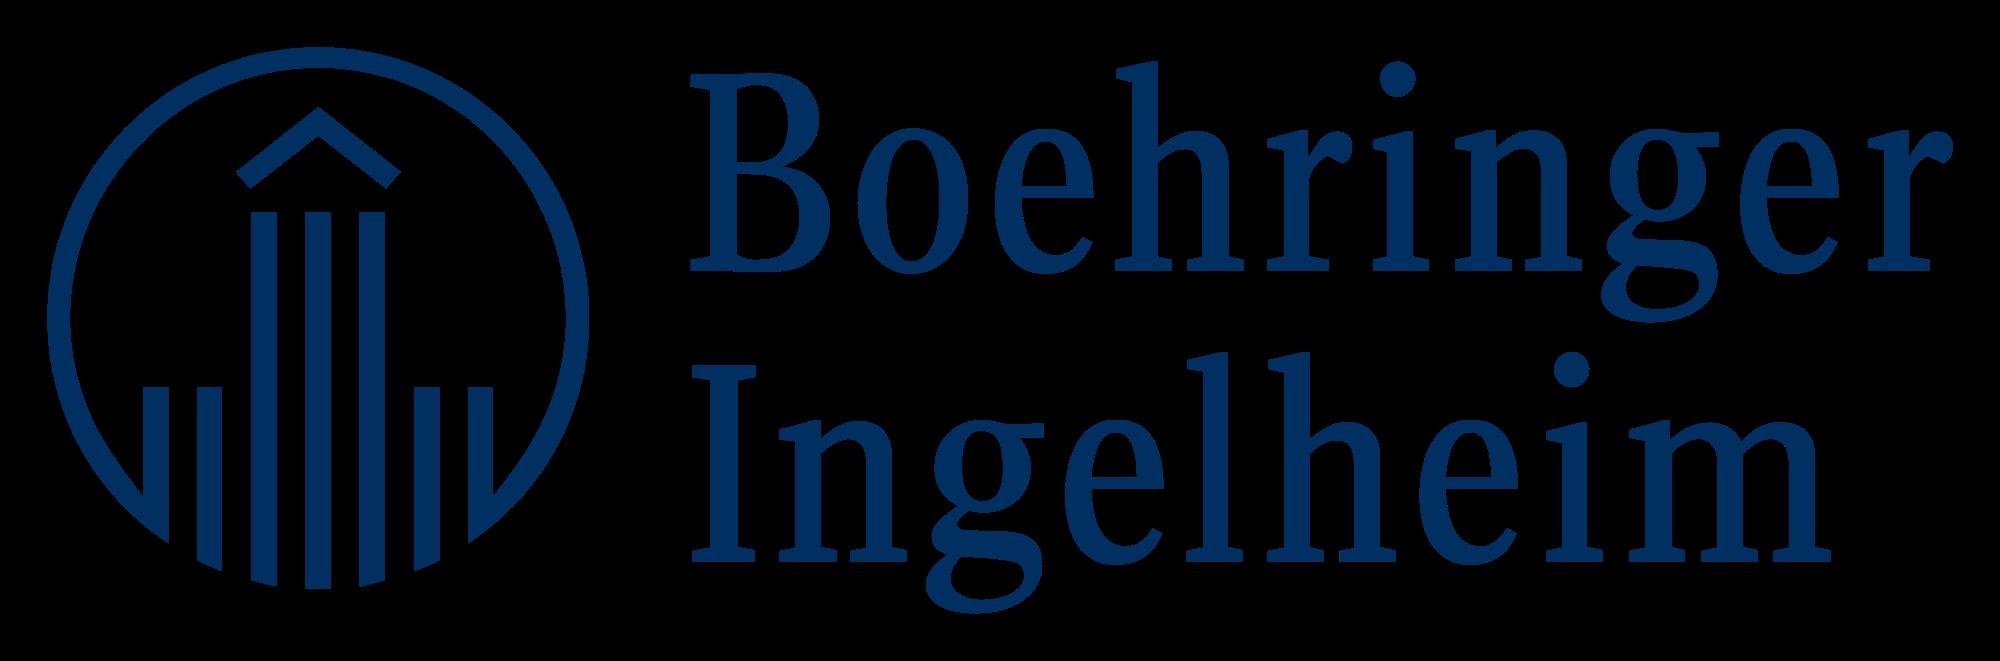 Boehringer-Ingelgheim